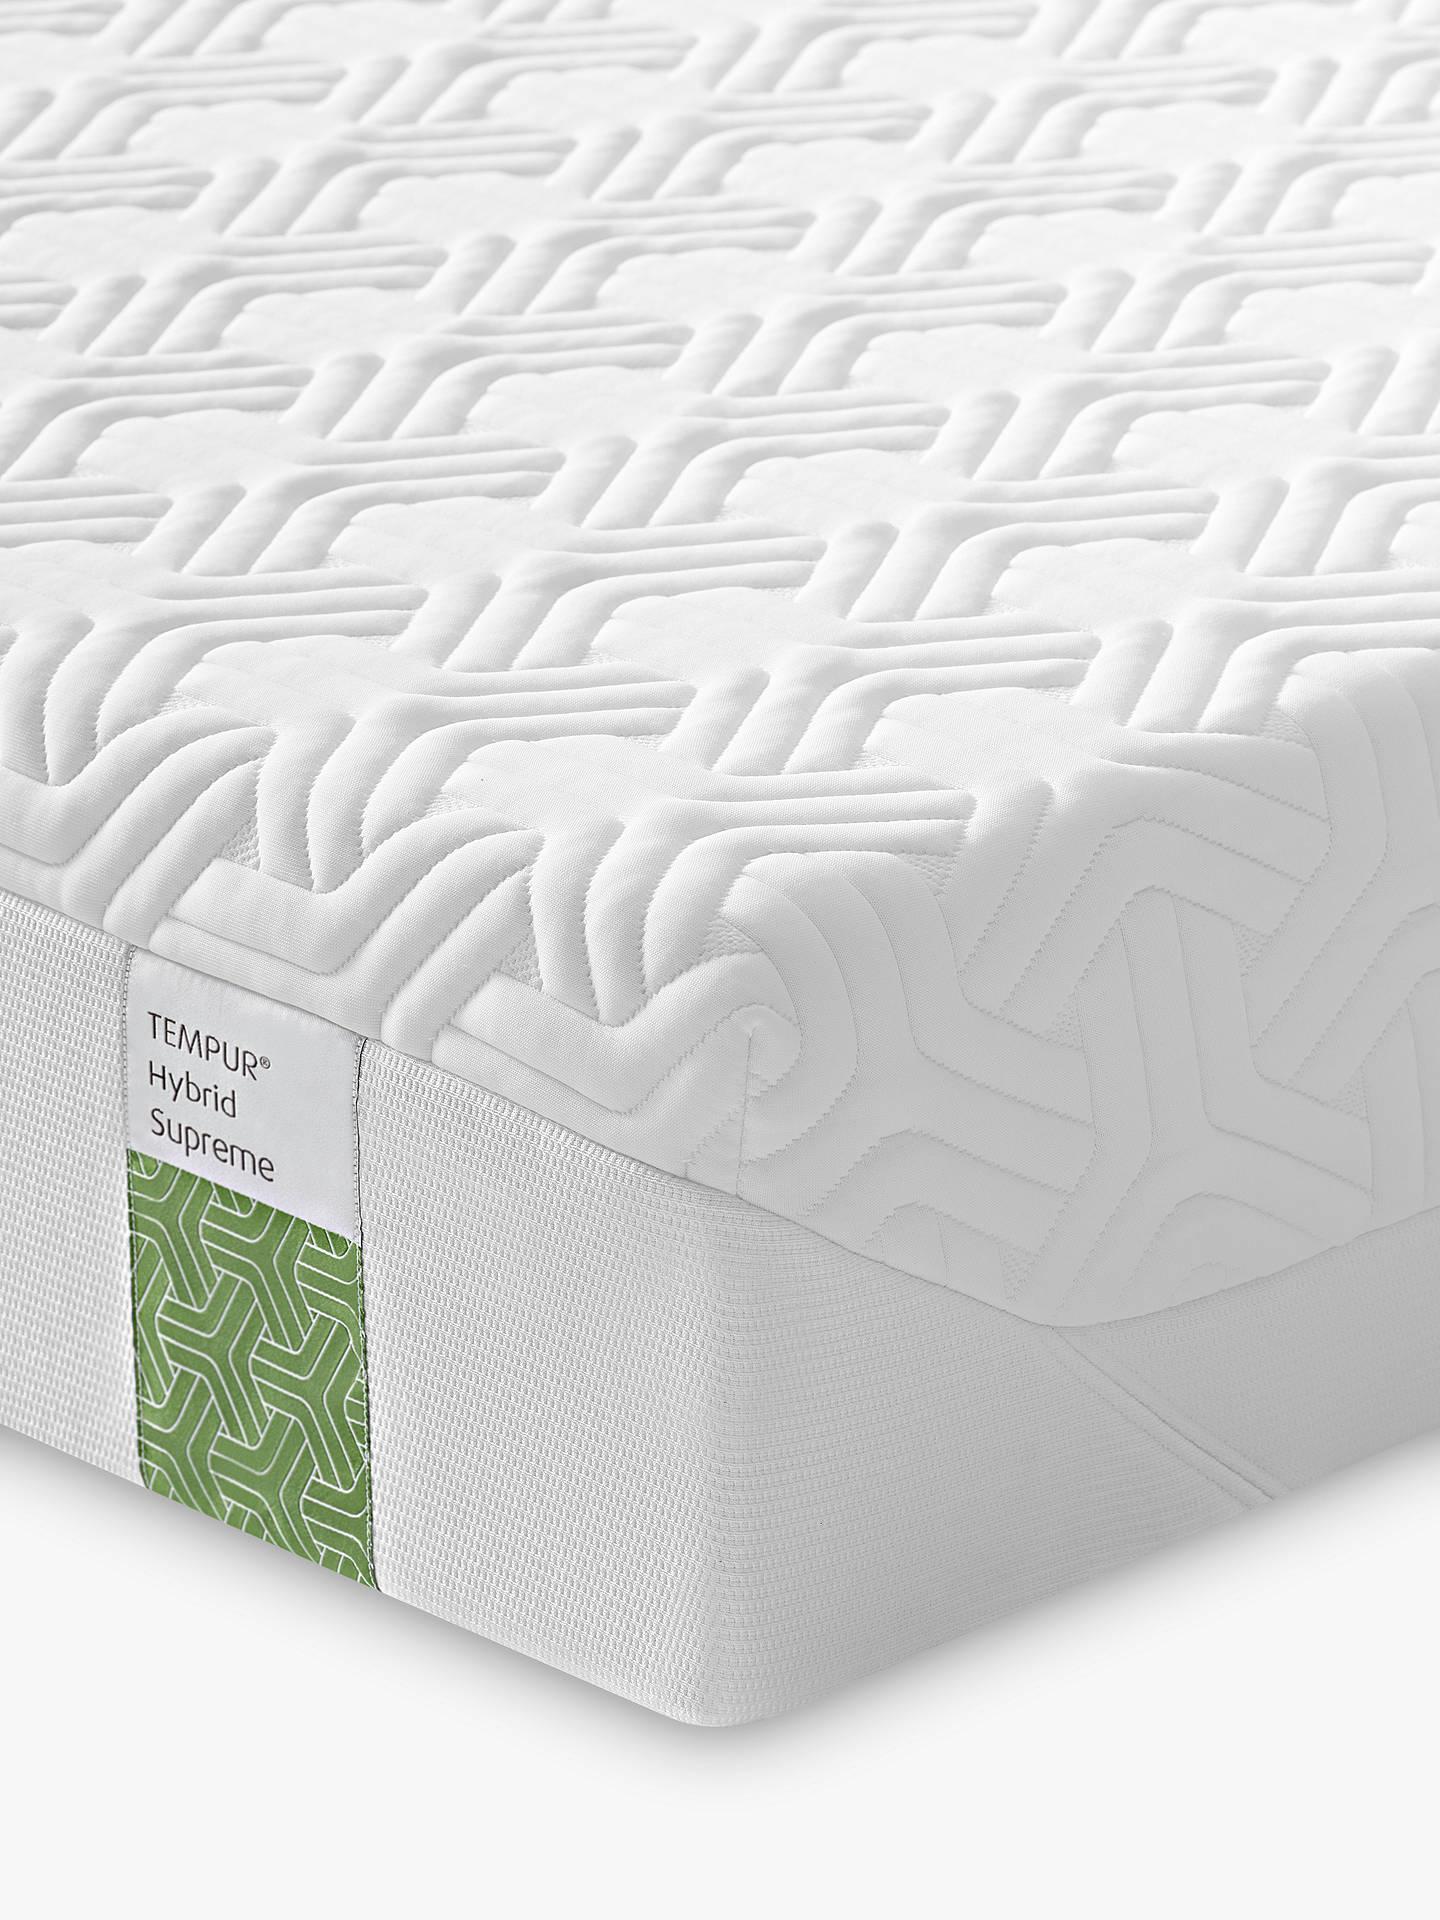 info for d84b5 8f42f Tempur Hybrid Supreme 21 Pocket Spring Memory Foam Mattress, Medium, Super  King Size